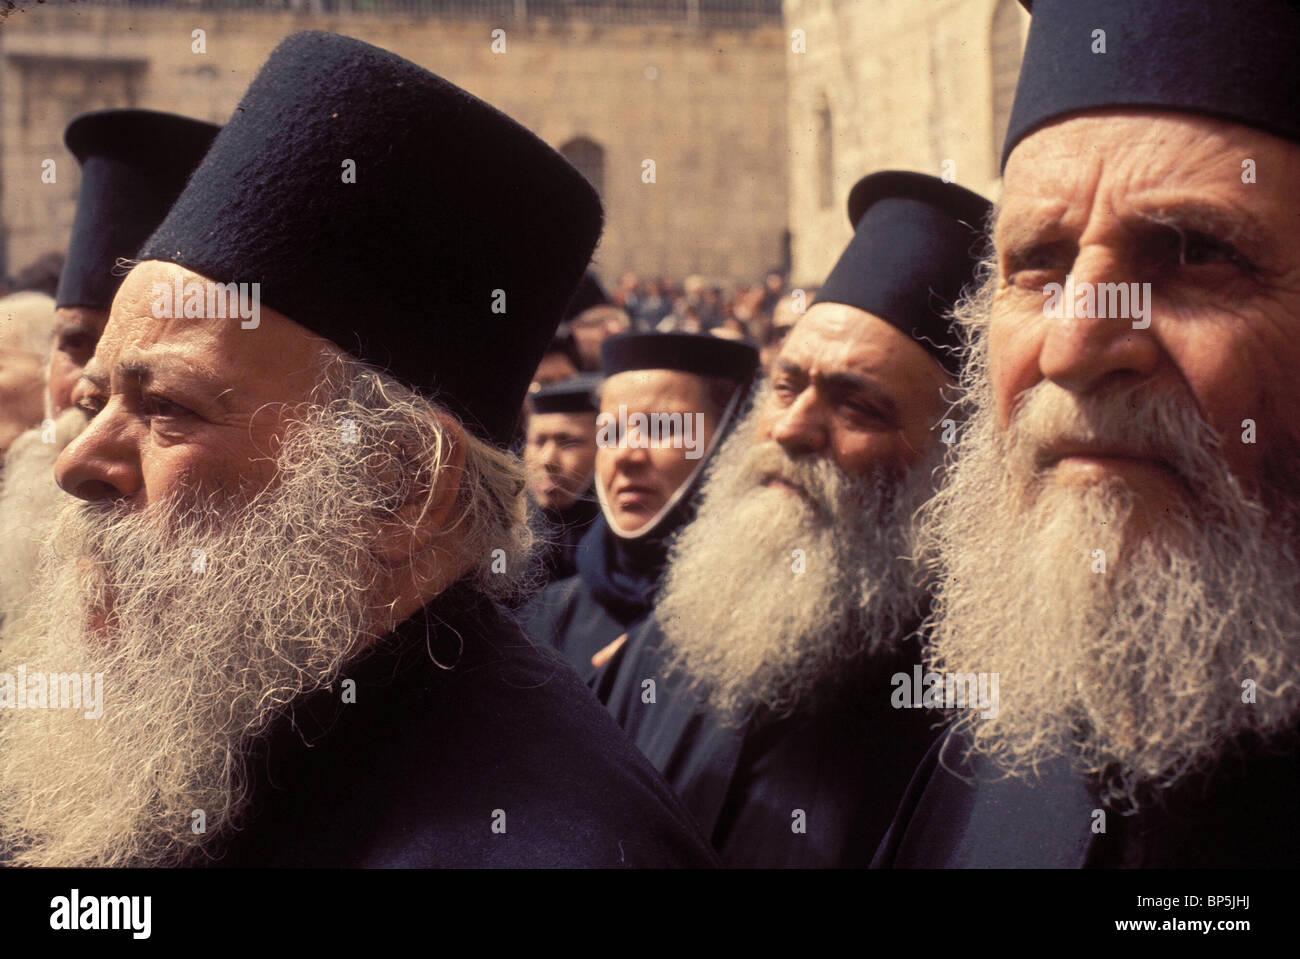 3981. GREEK ORTHODOX PILGRIMS DURING EASTER CELEBRATIONS IN JERUSALEM - Stock Image